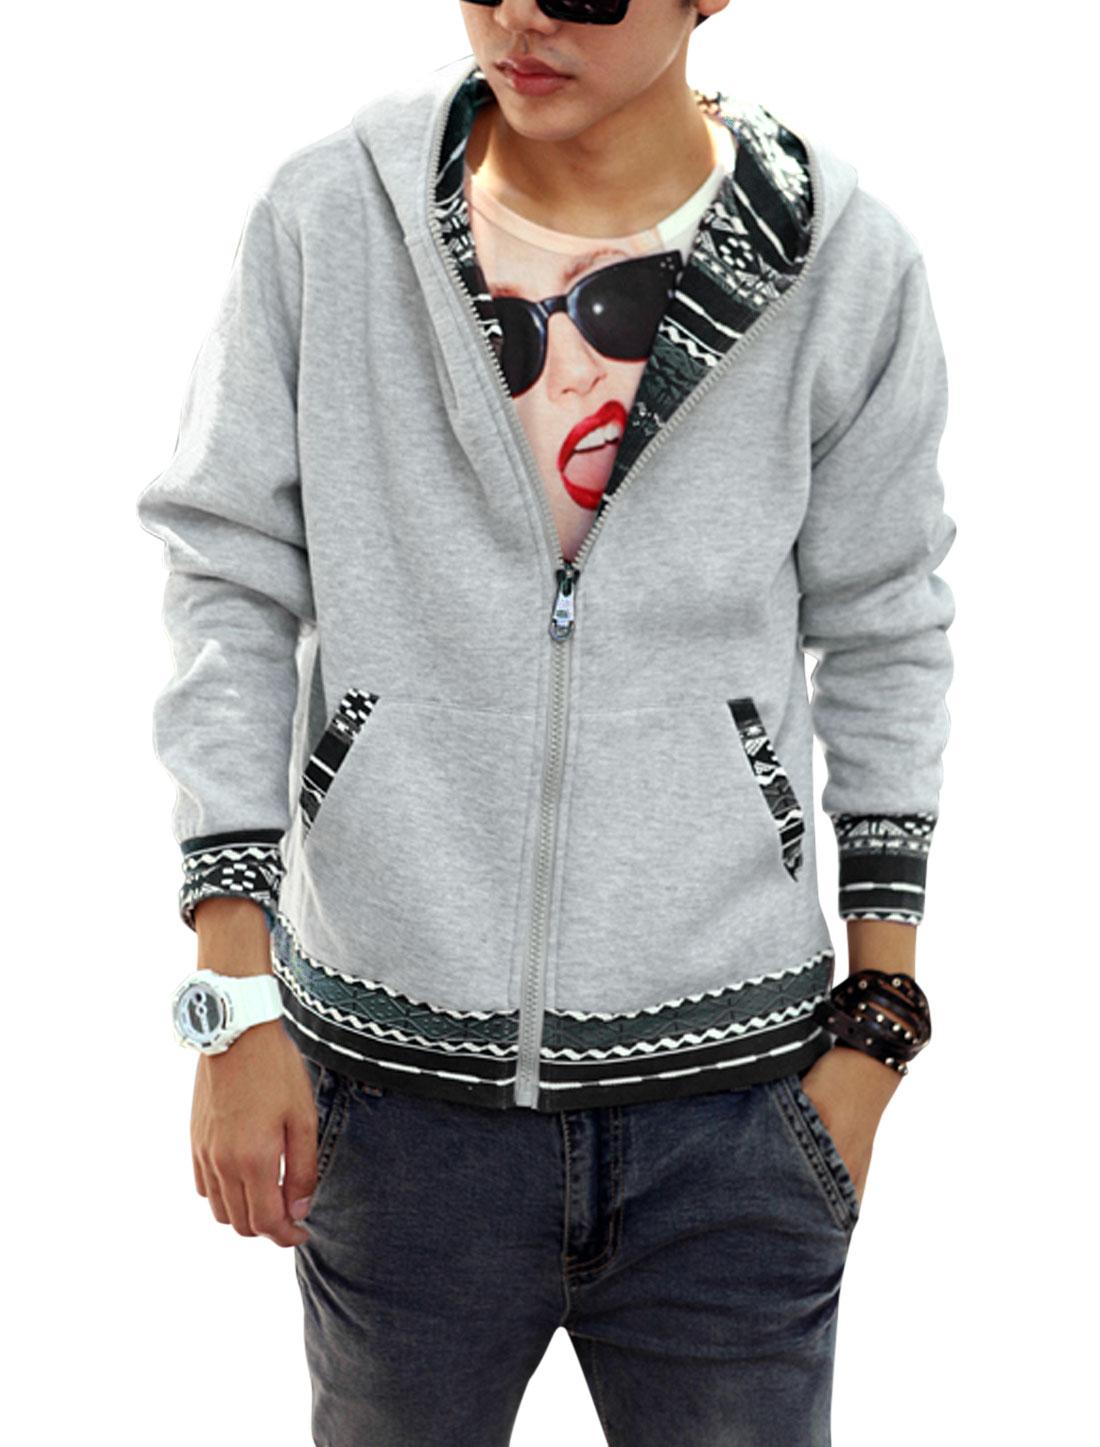 Man Geometric Prints Zip Up Basic Hooded Jacket Light Gray M